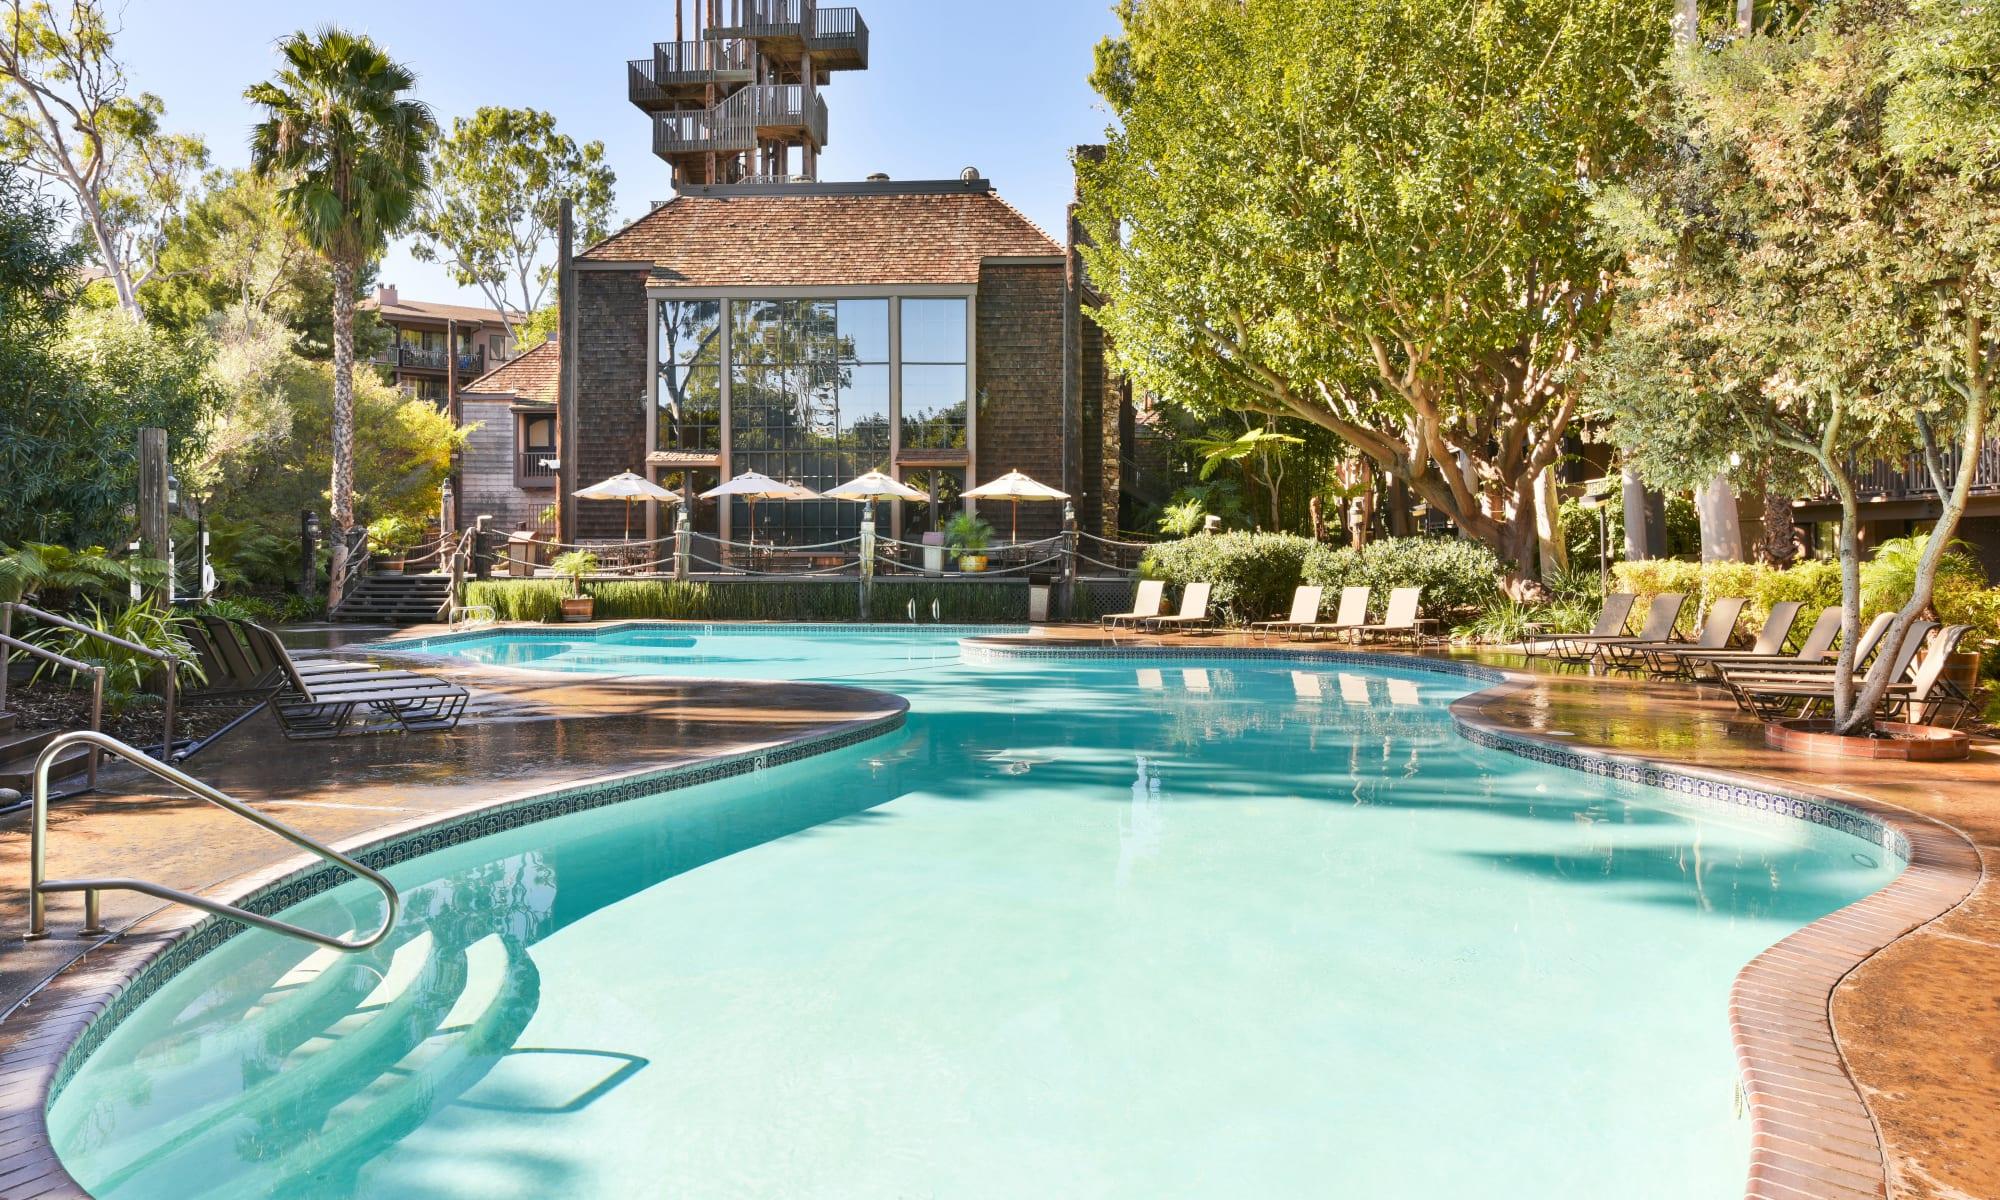 Resort-style swimming pool at Mariners Village in Marina del Rey, California